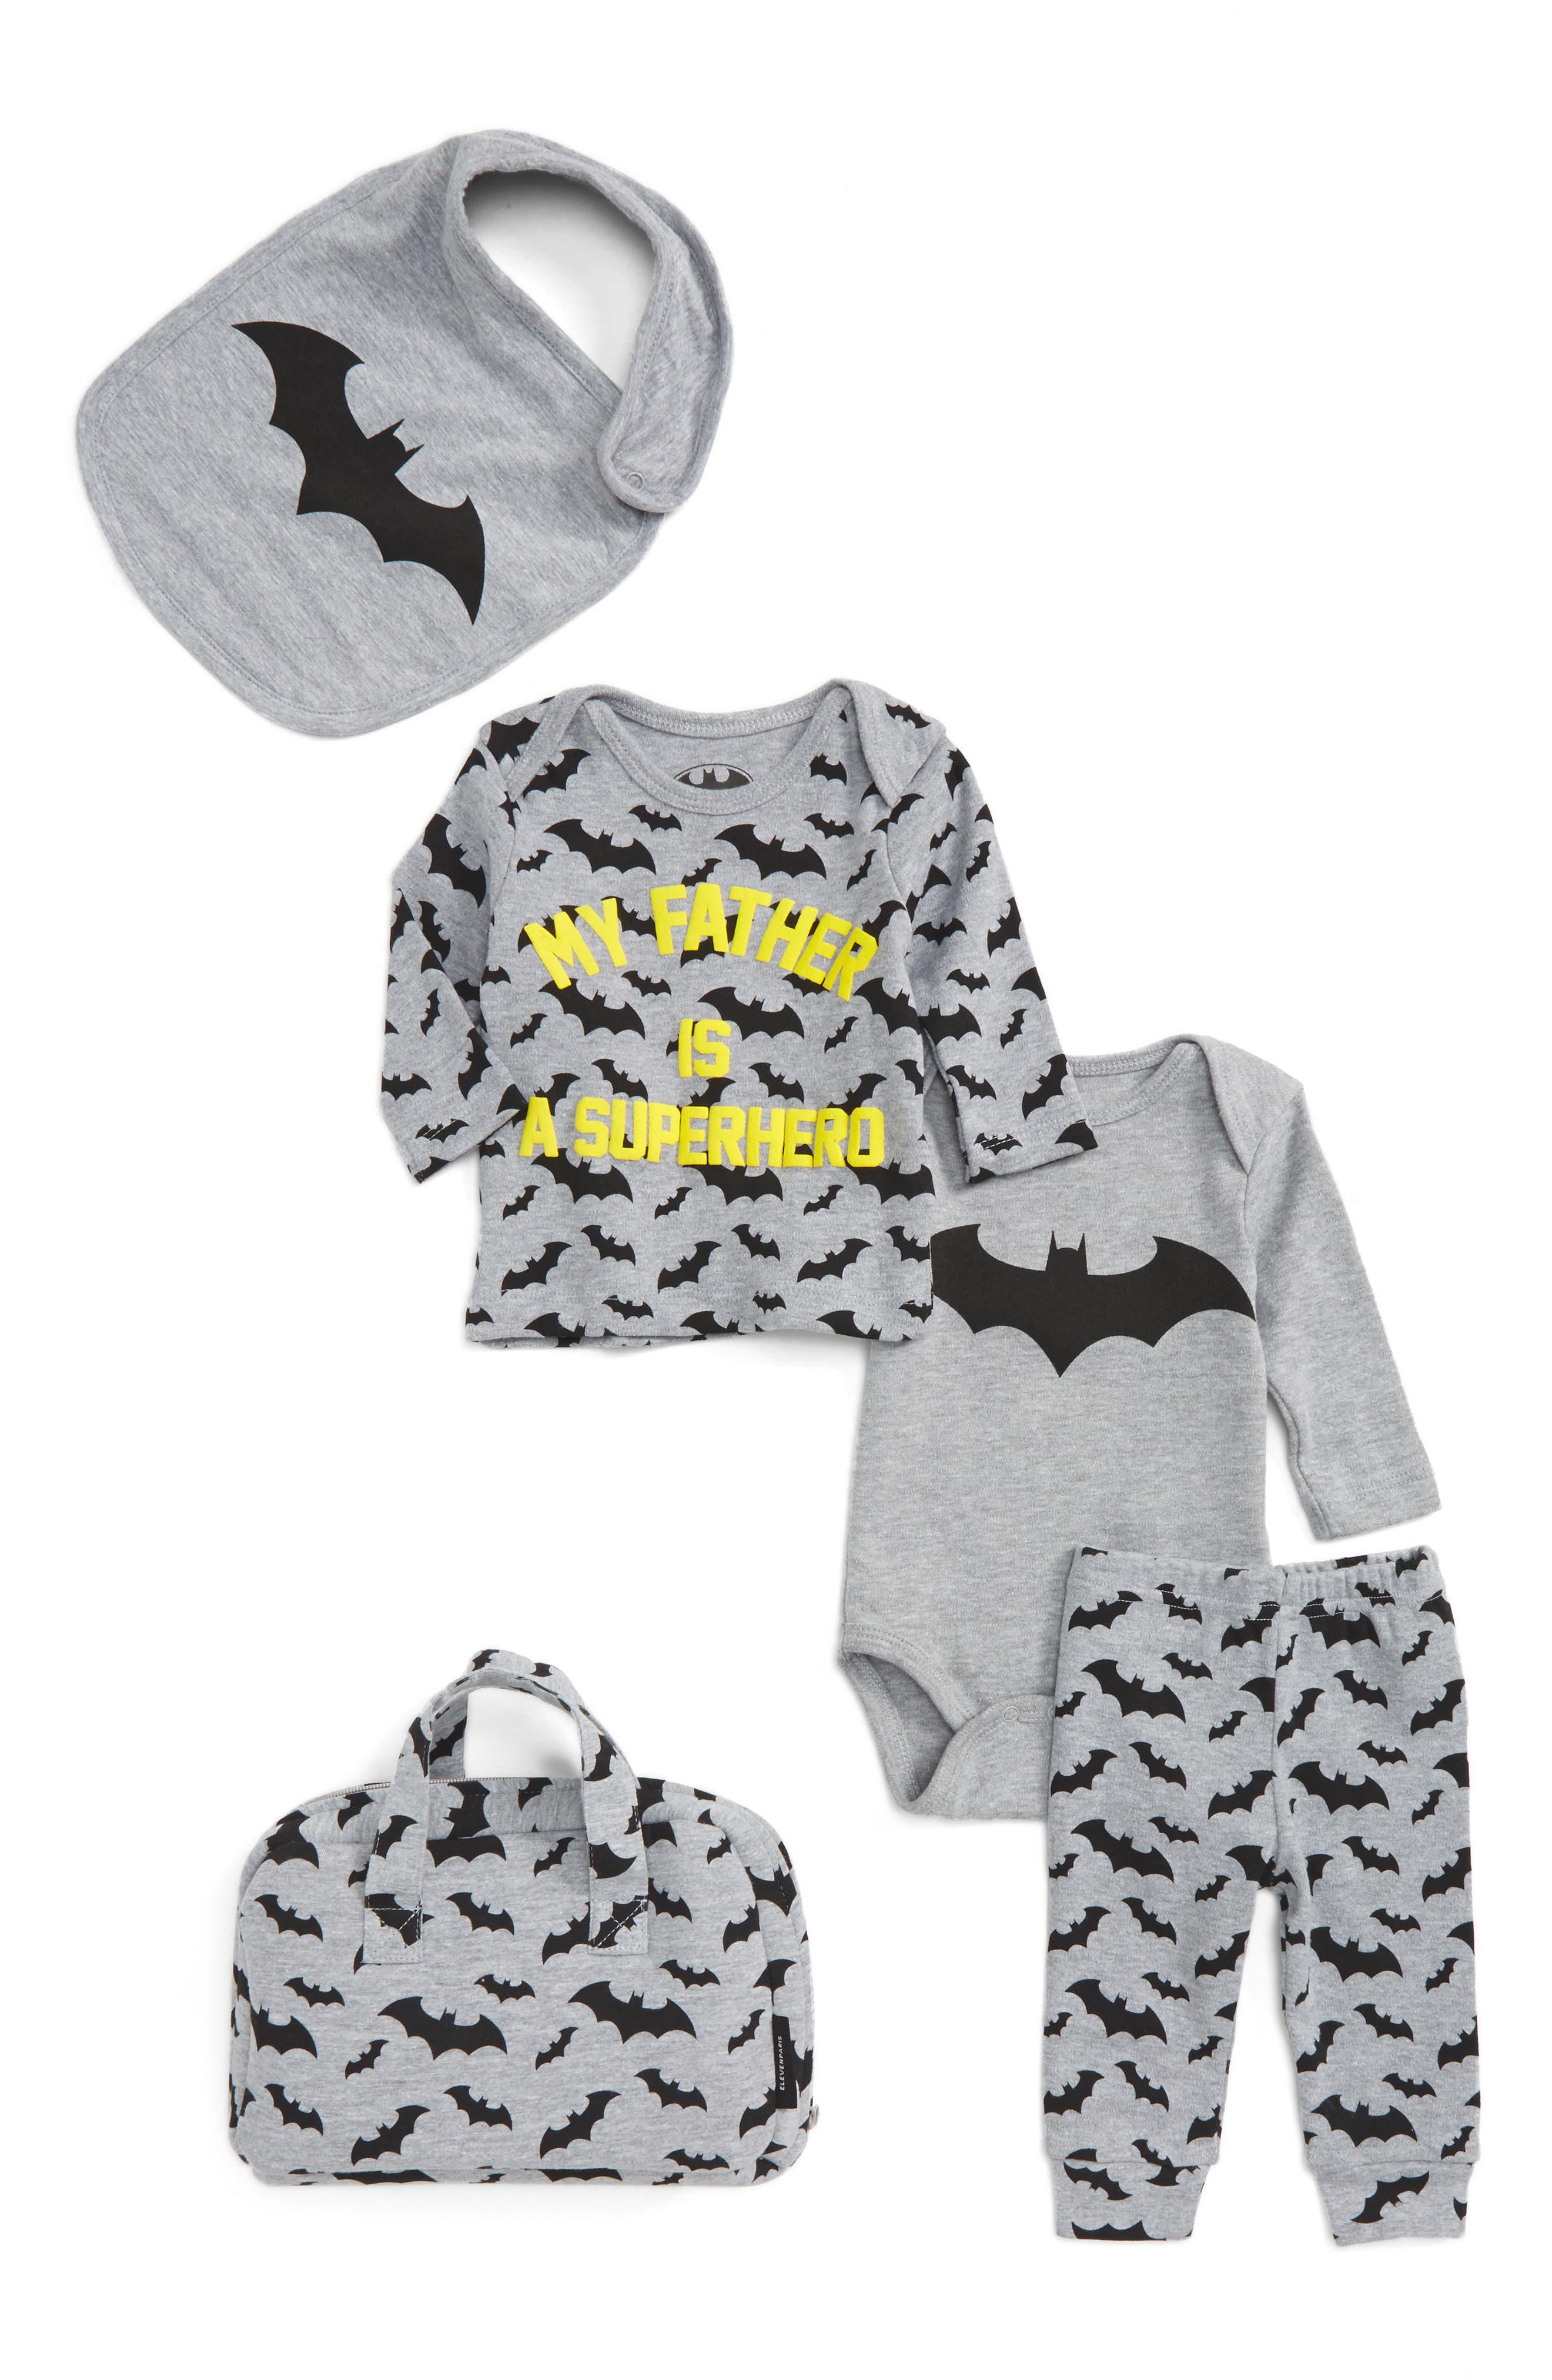 Main Image - Little ELEVENPARIS My Father is a Superhero - Bat Five-Piece Gift Set (Baby Boys)